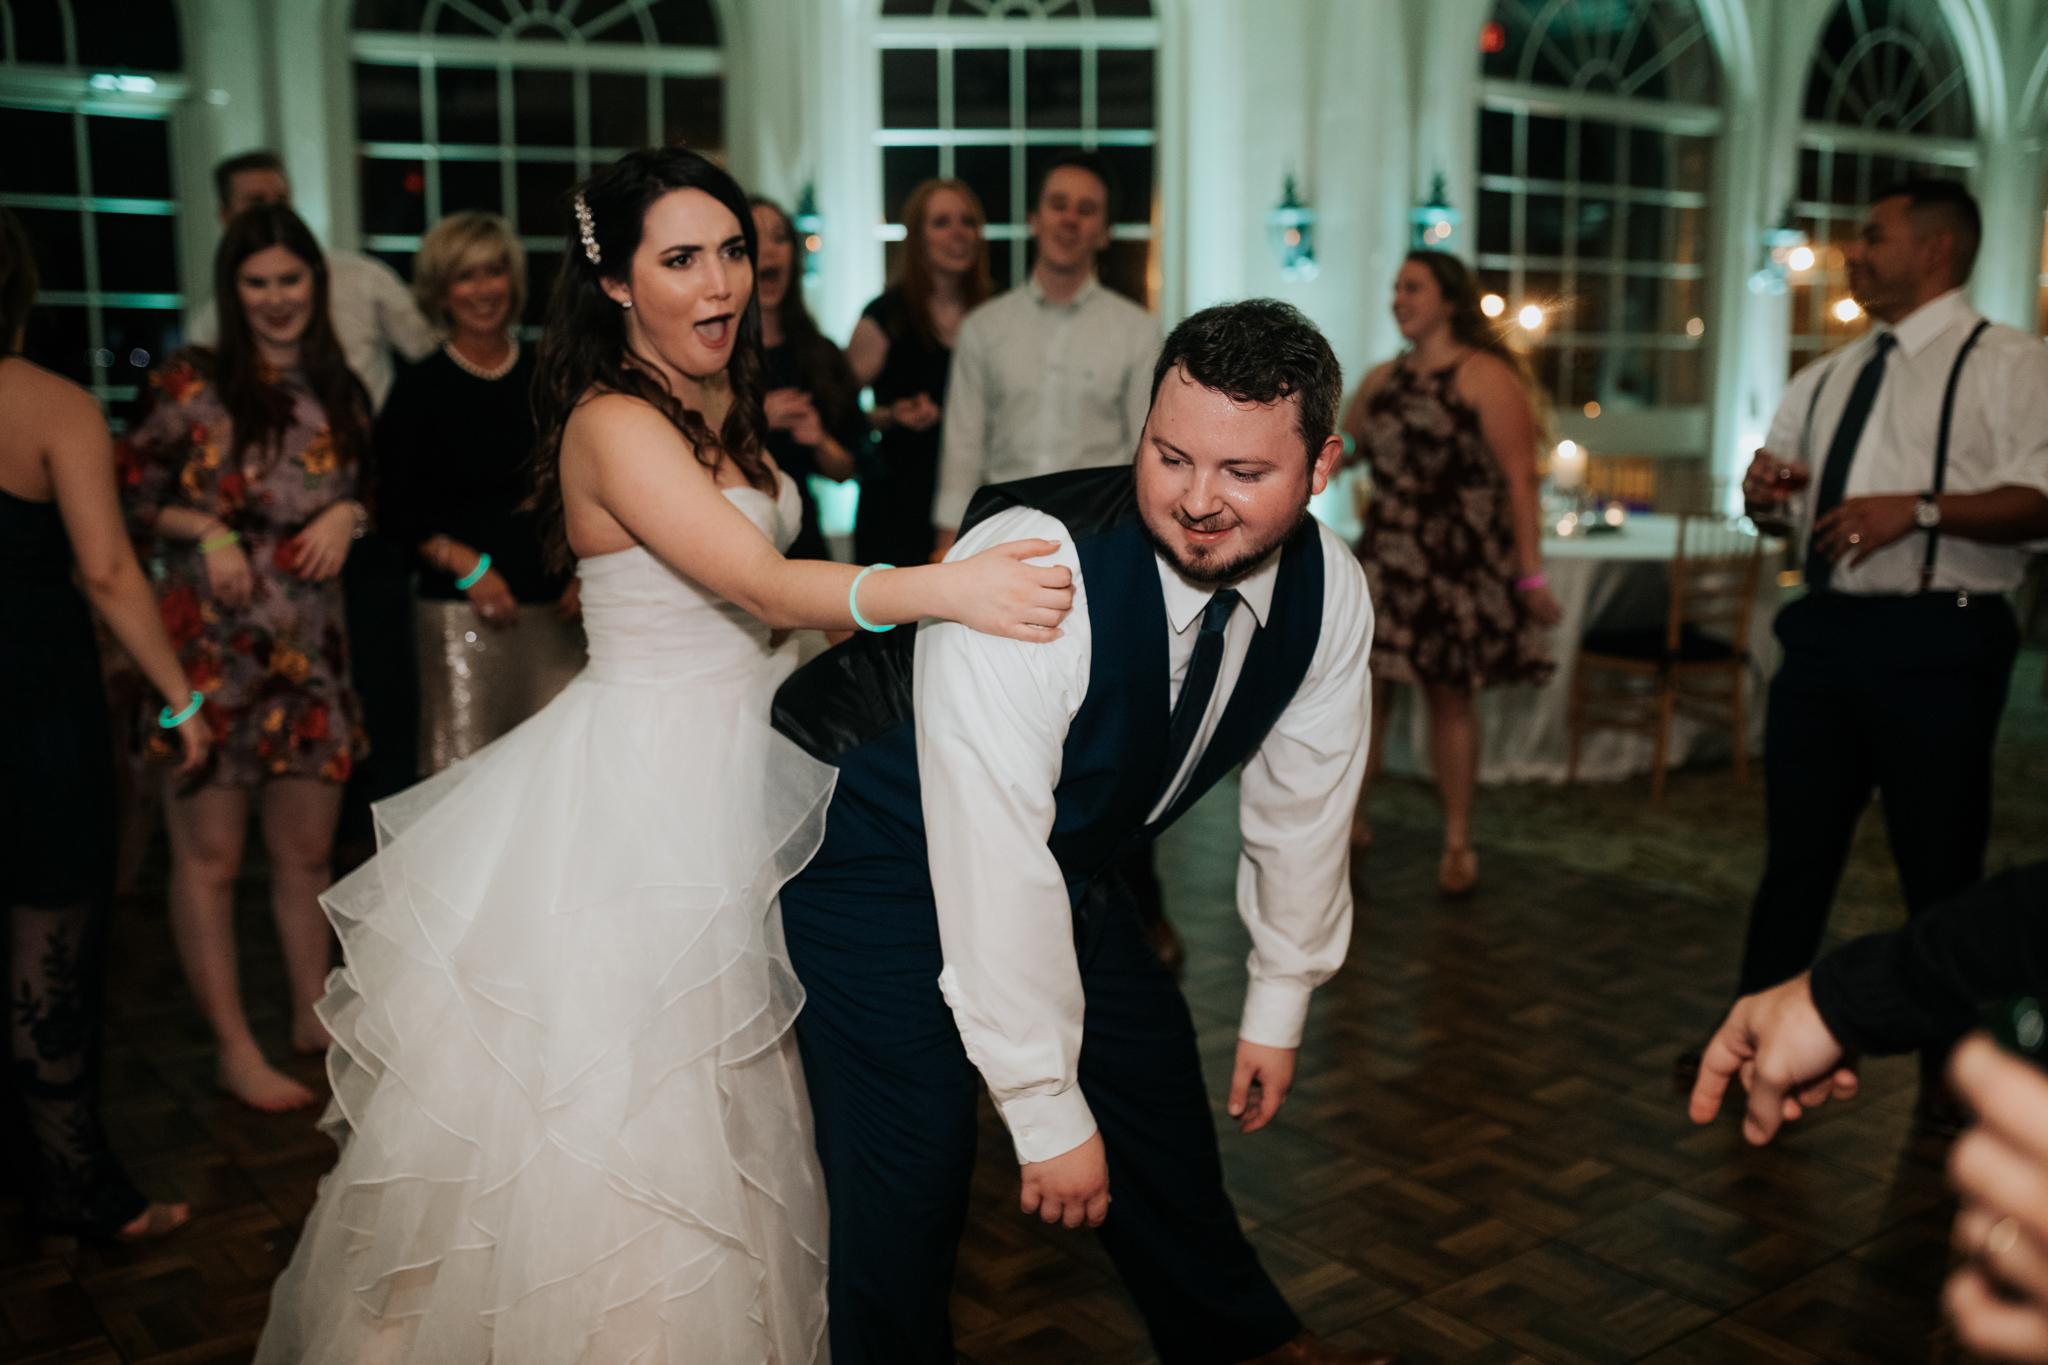 Leah Nicole Photography - Houston Wedding Photographer-Lake Conroe Wedding- Houston Wedding Photographer-55.jpg